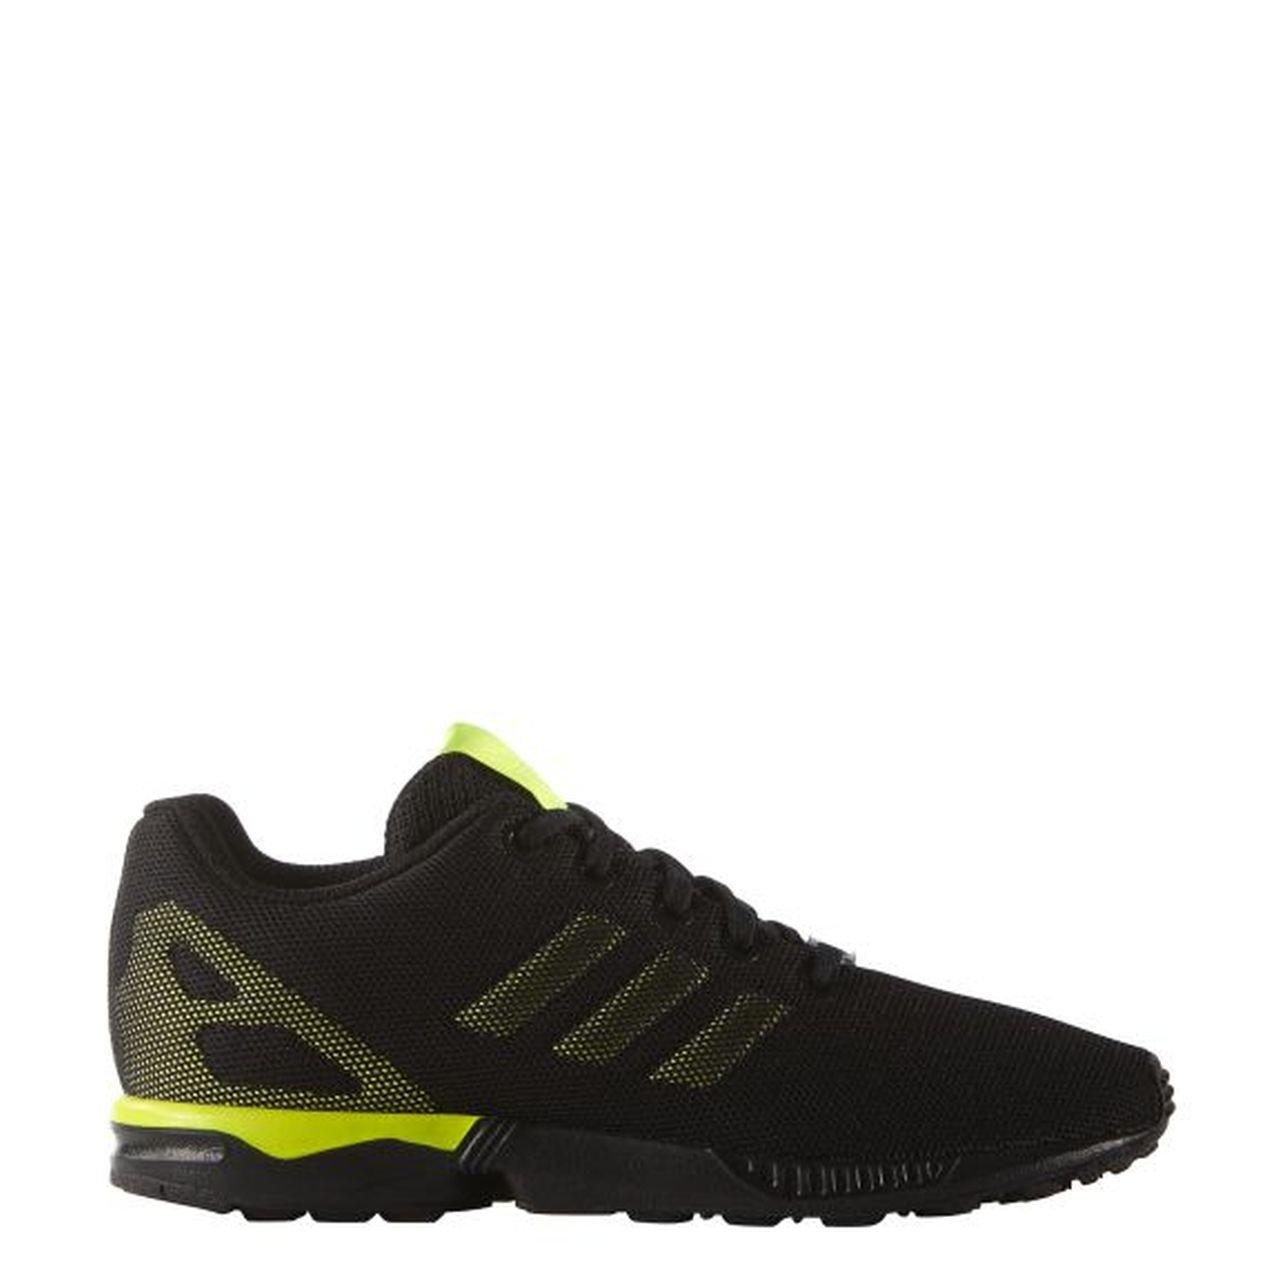 promo code 1c248 5afe5 adidas Boys Originals Junior Boys ZX Flux Trainers in Black ...